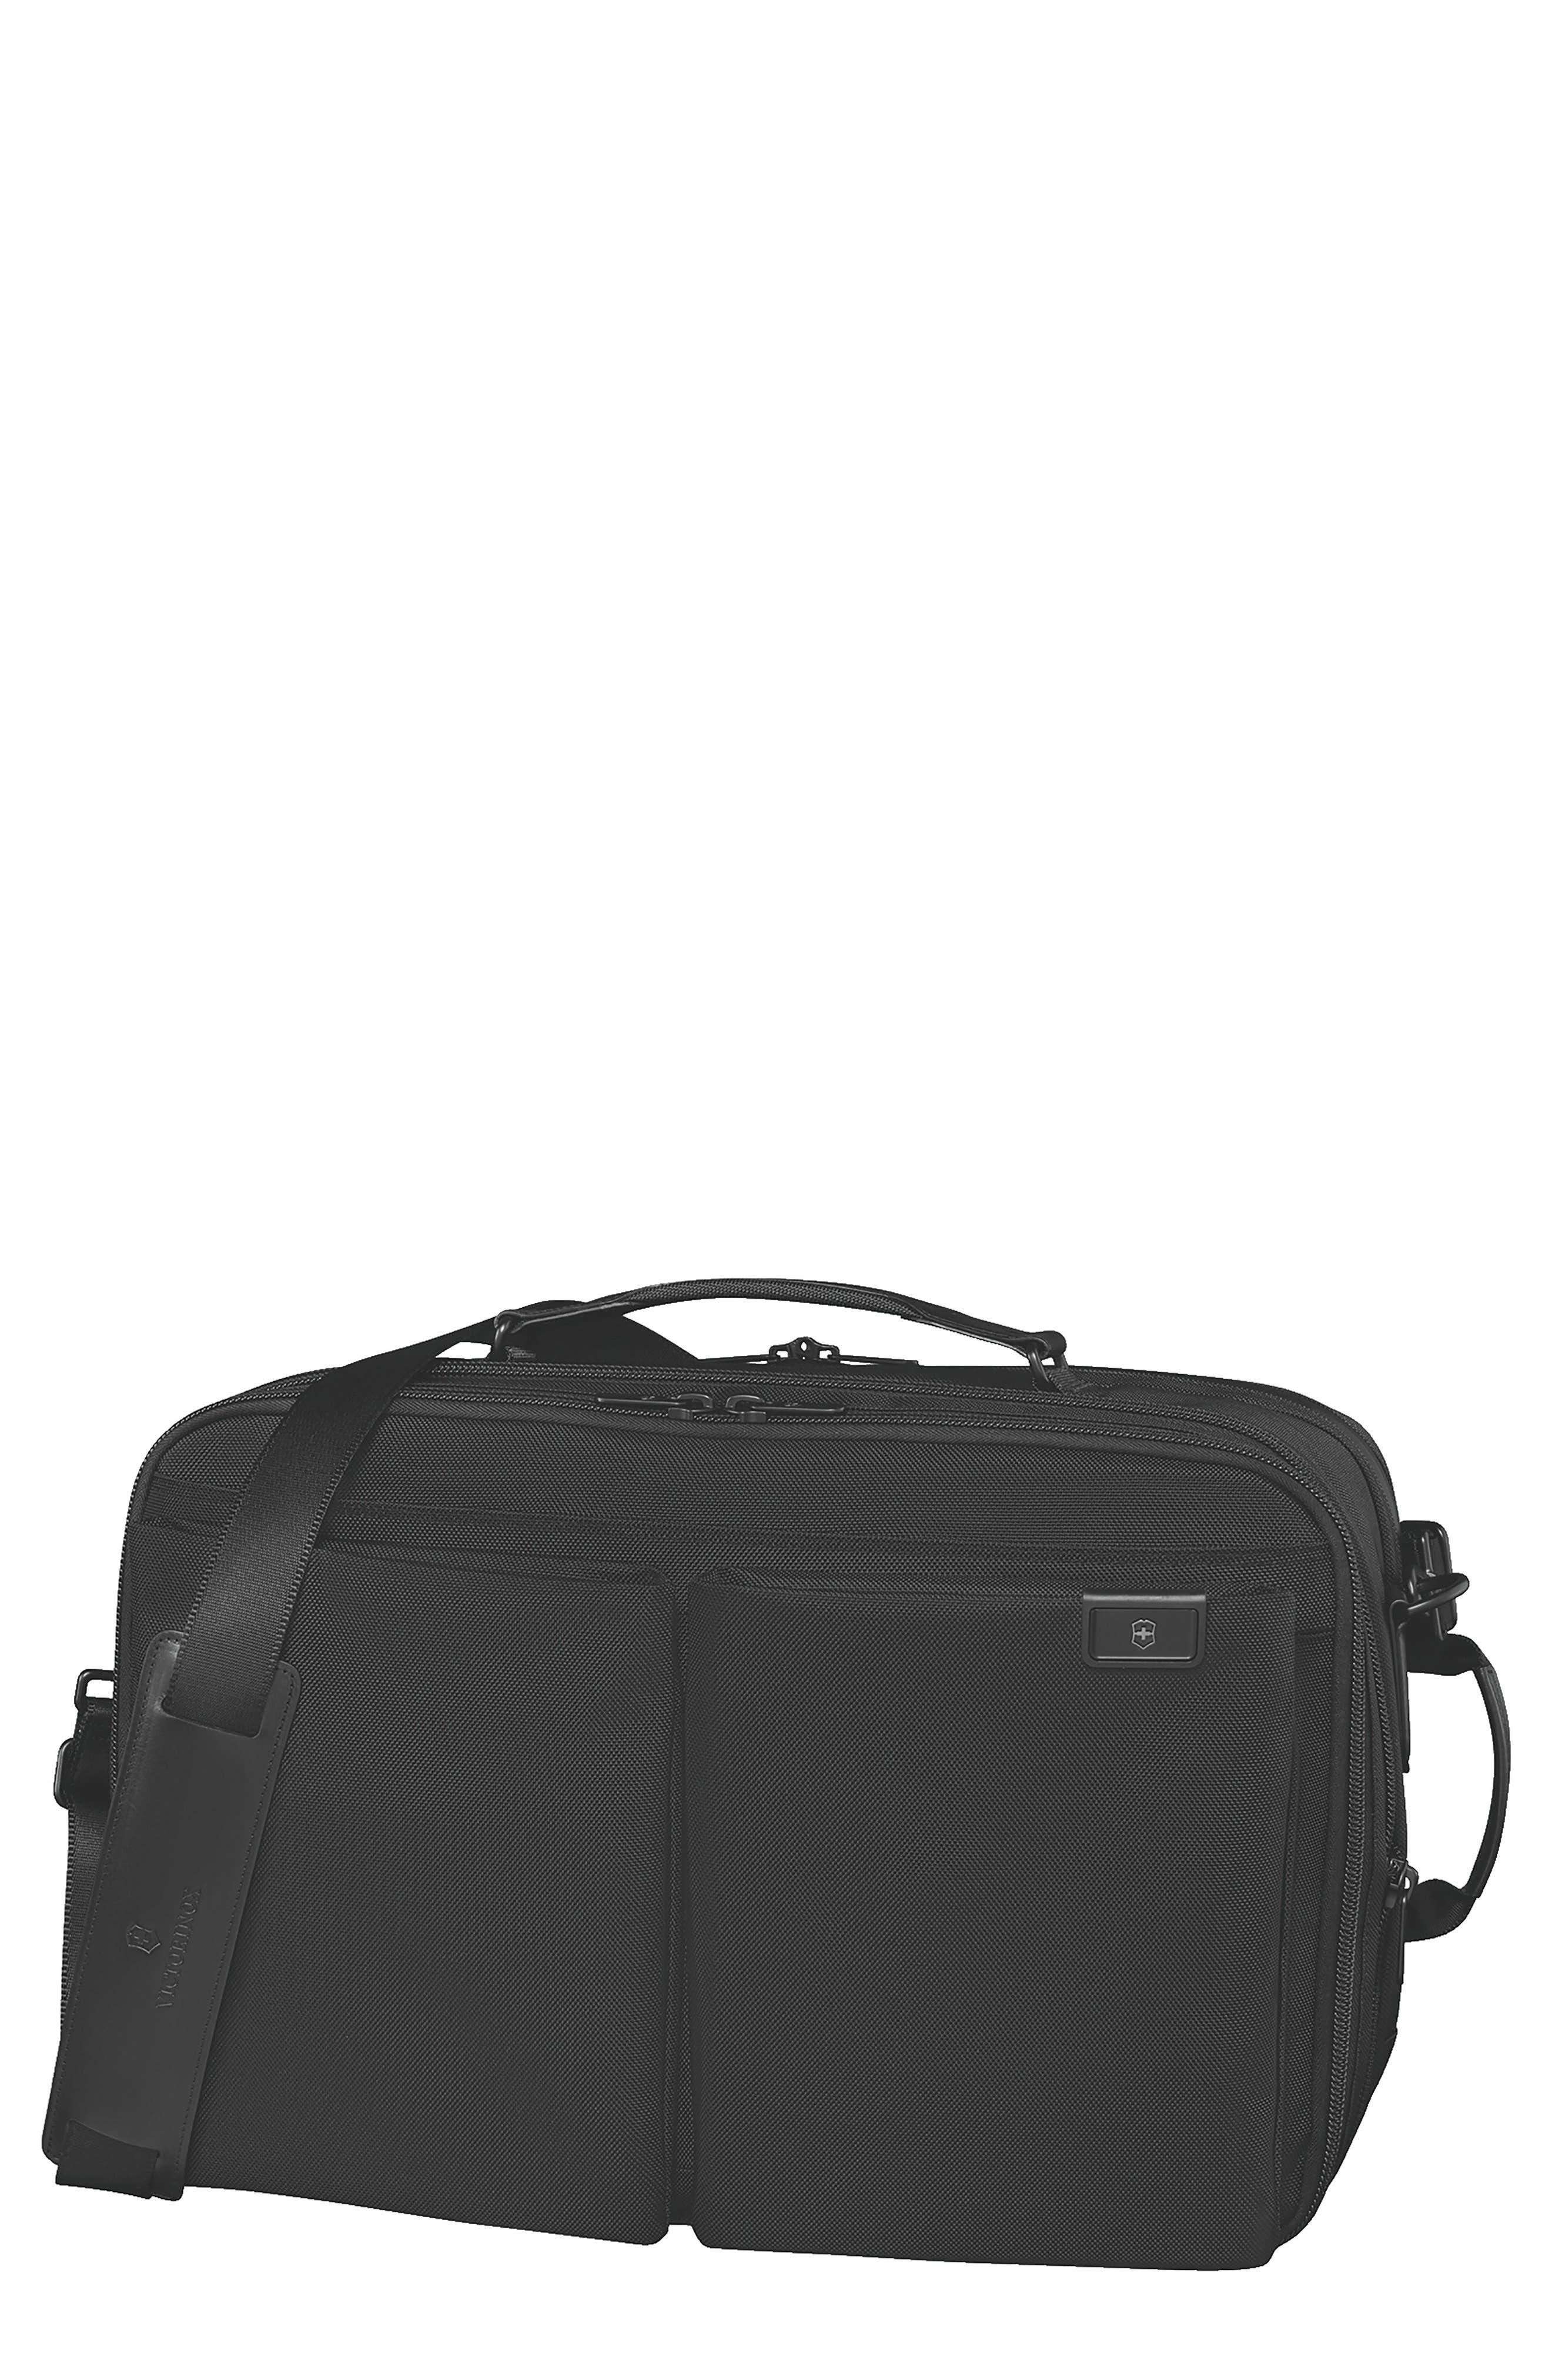 Lexicon 2.0 Convertible Backpack,                             Main thumbnail 1, color,                             Black